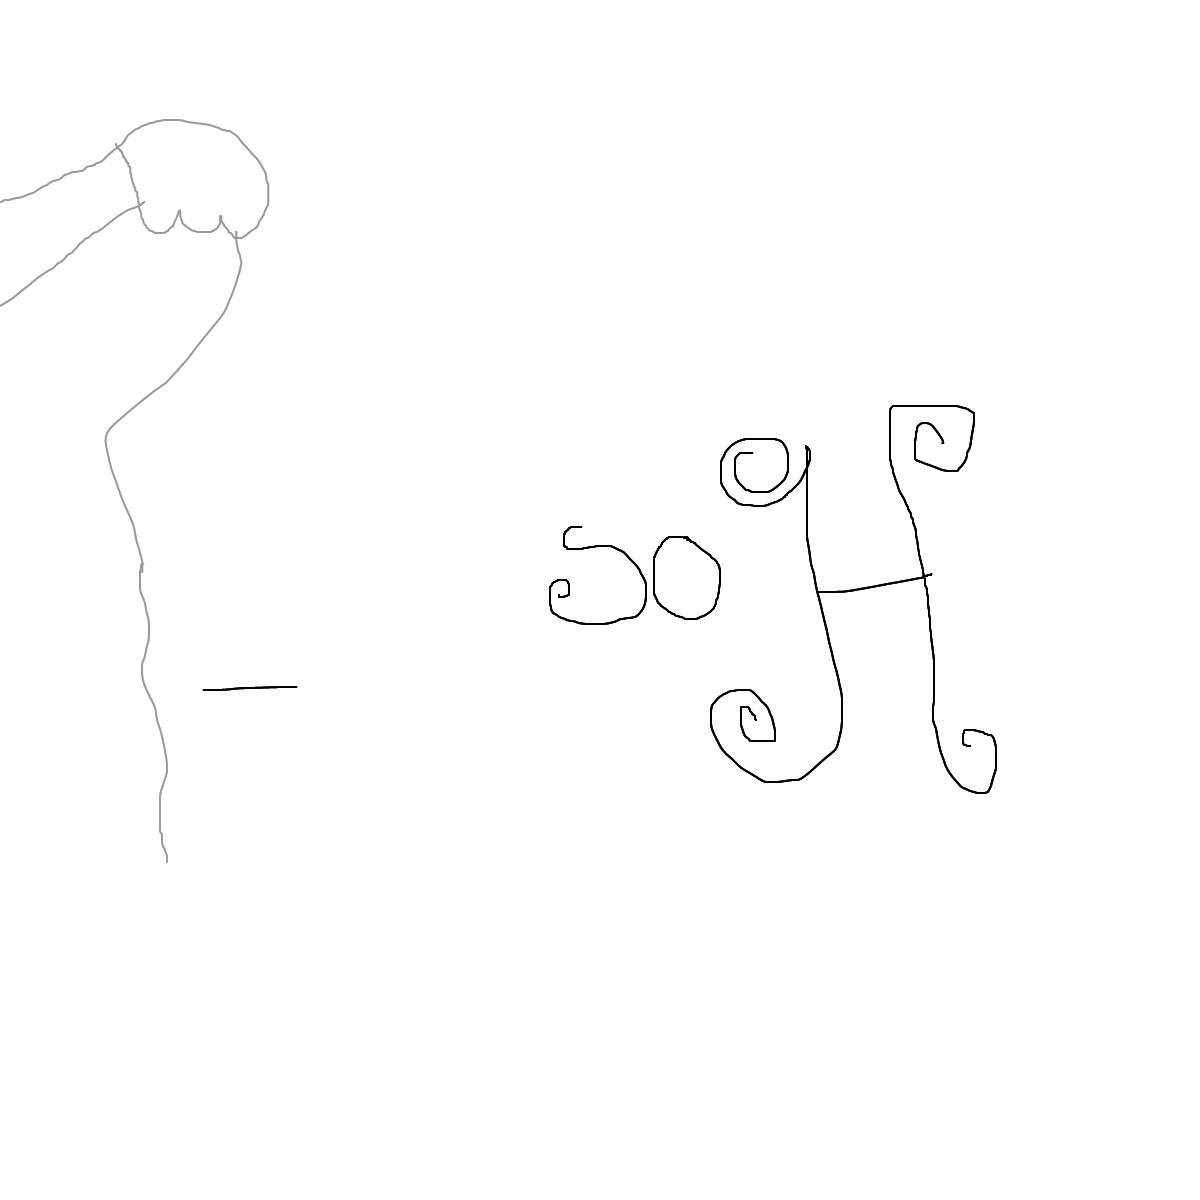 BAAAM drawing#720 lat:52.0847969055175800lng: 5.1685304641723630